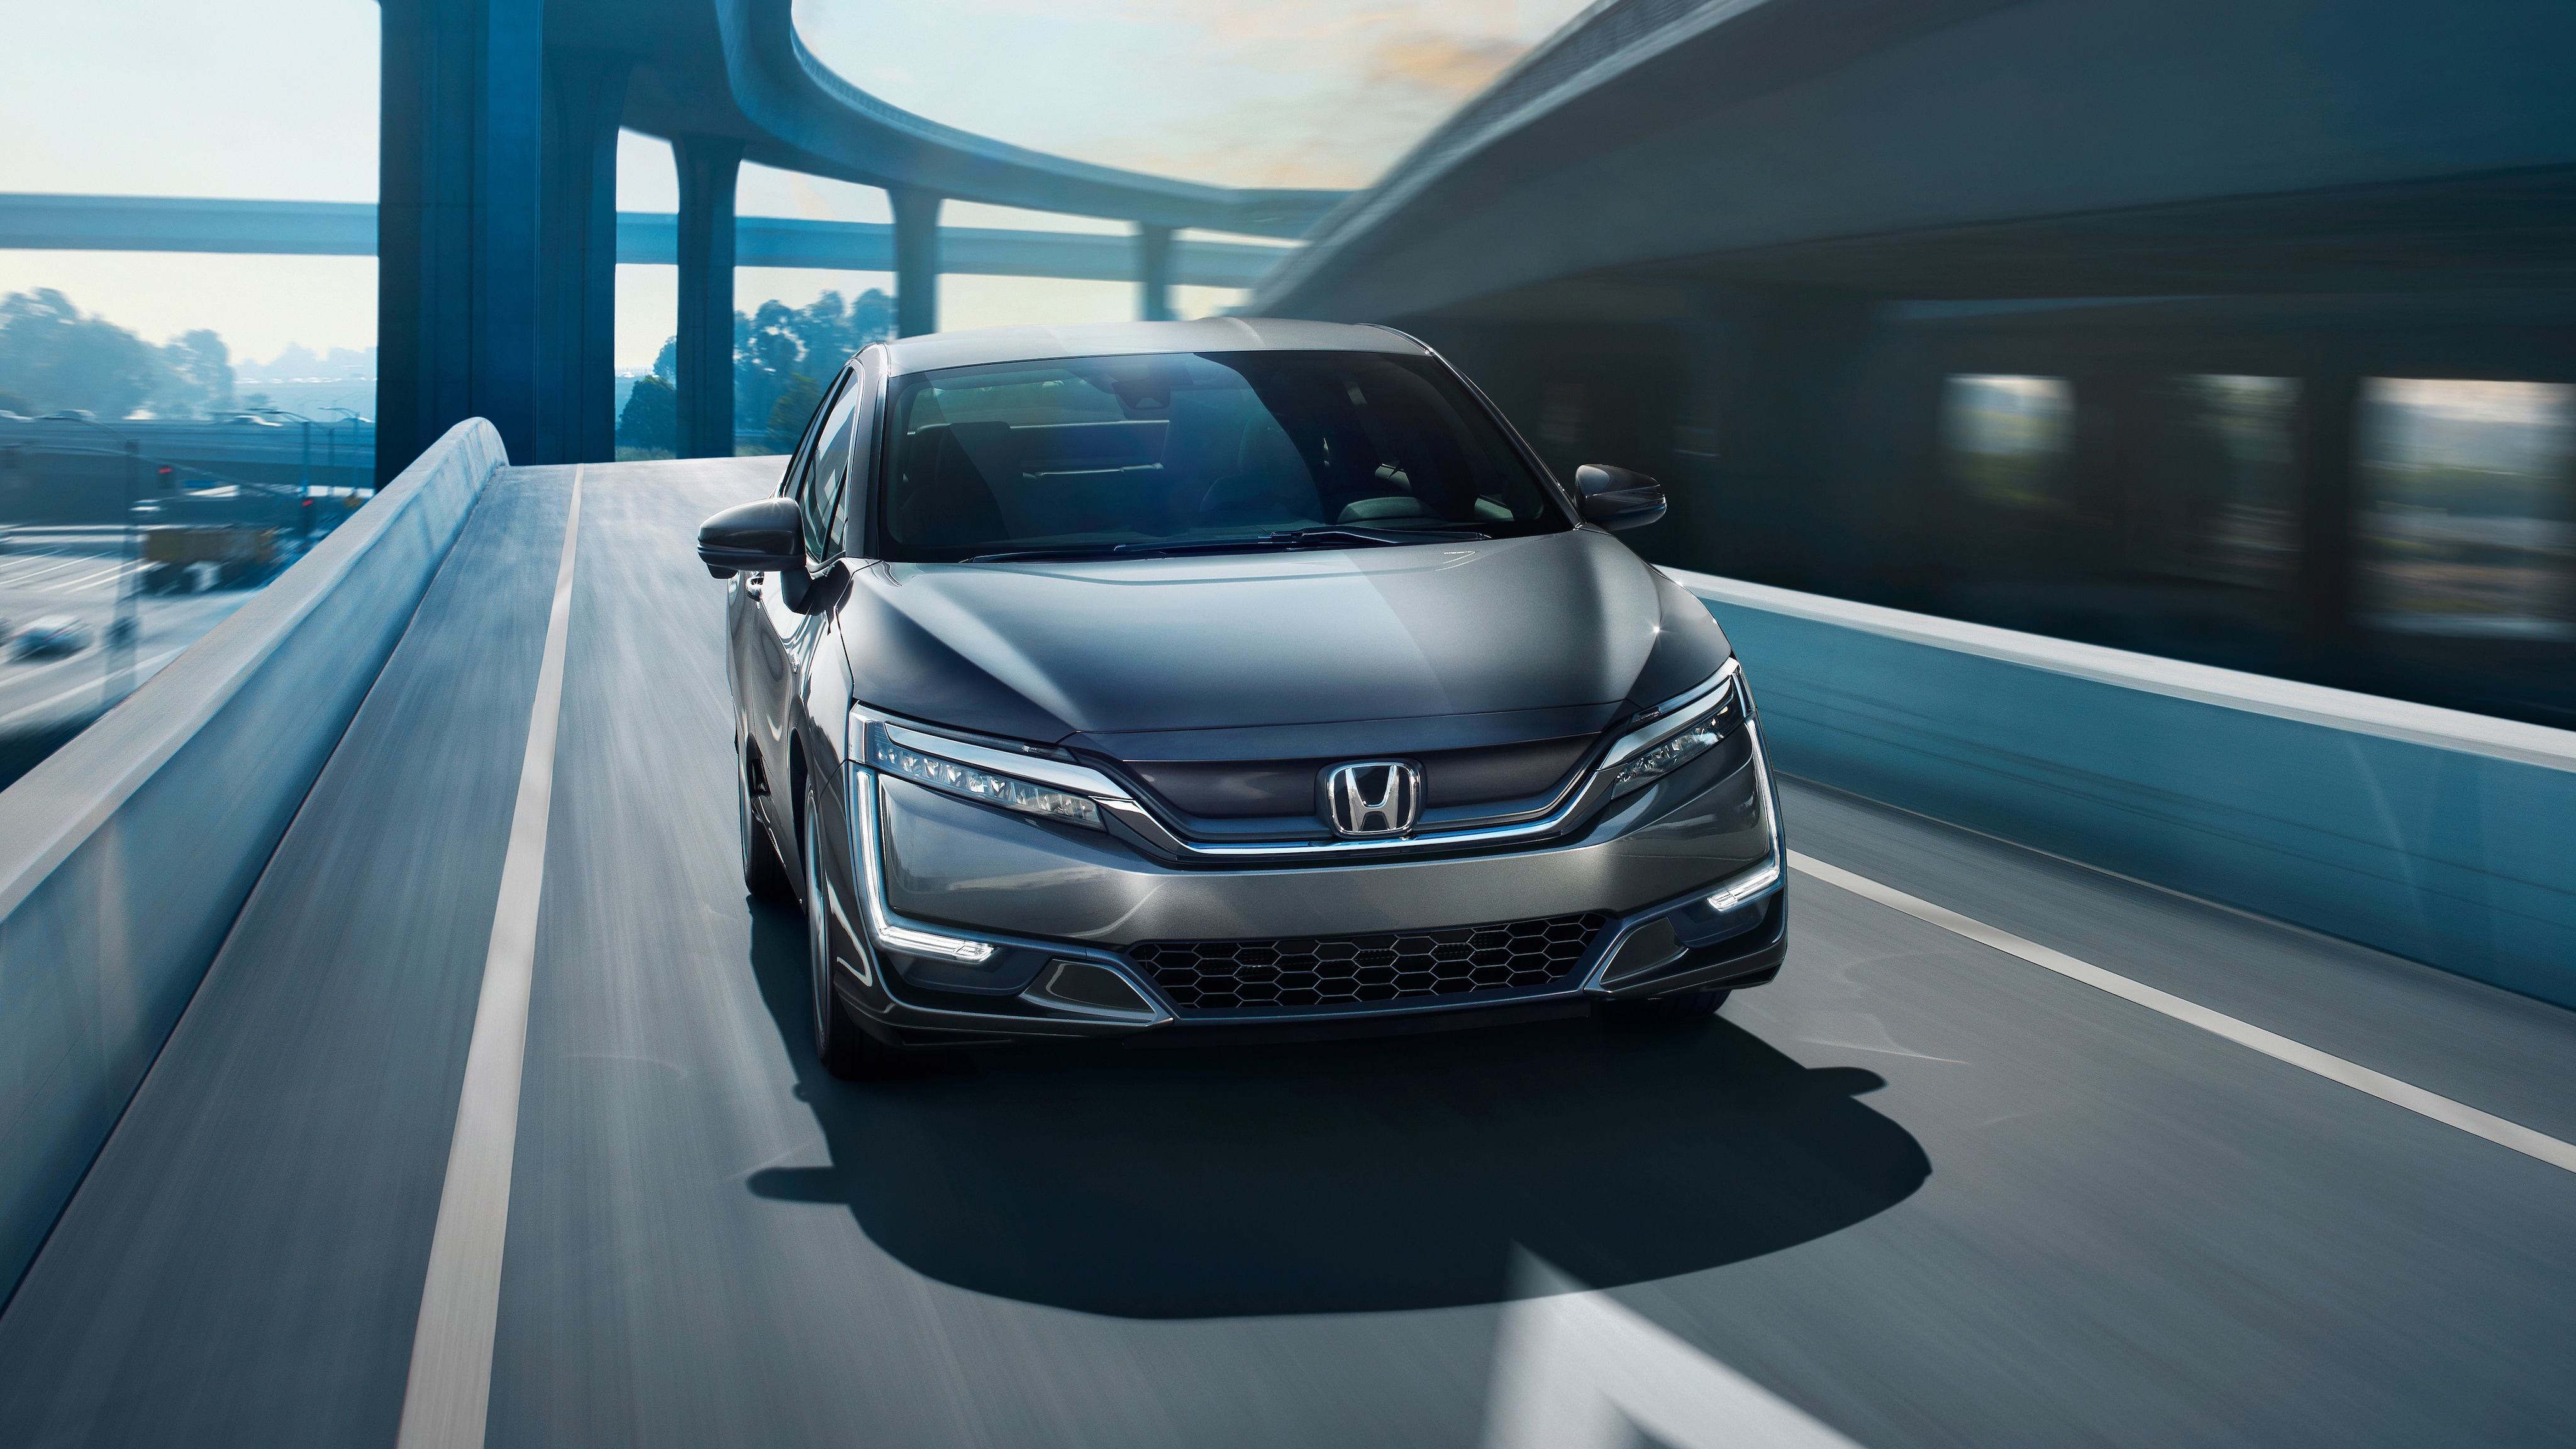 Zeigler Honda Kalamazoo | New Honda Dealership in Kalamazoo, MI